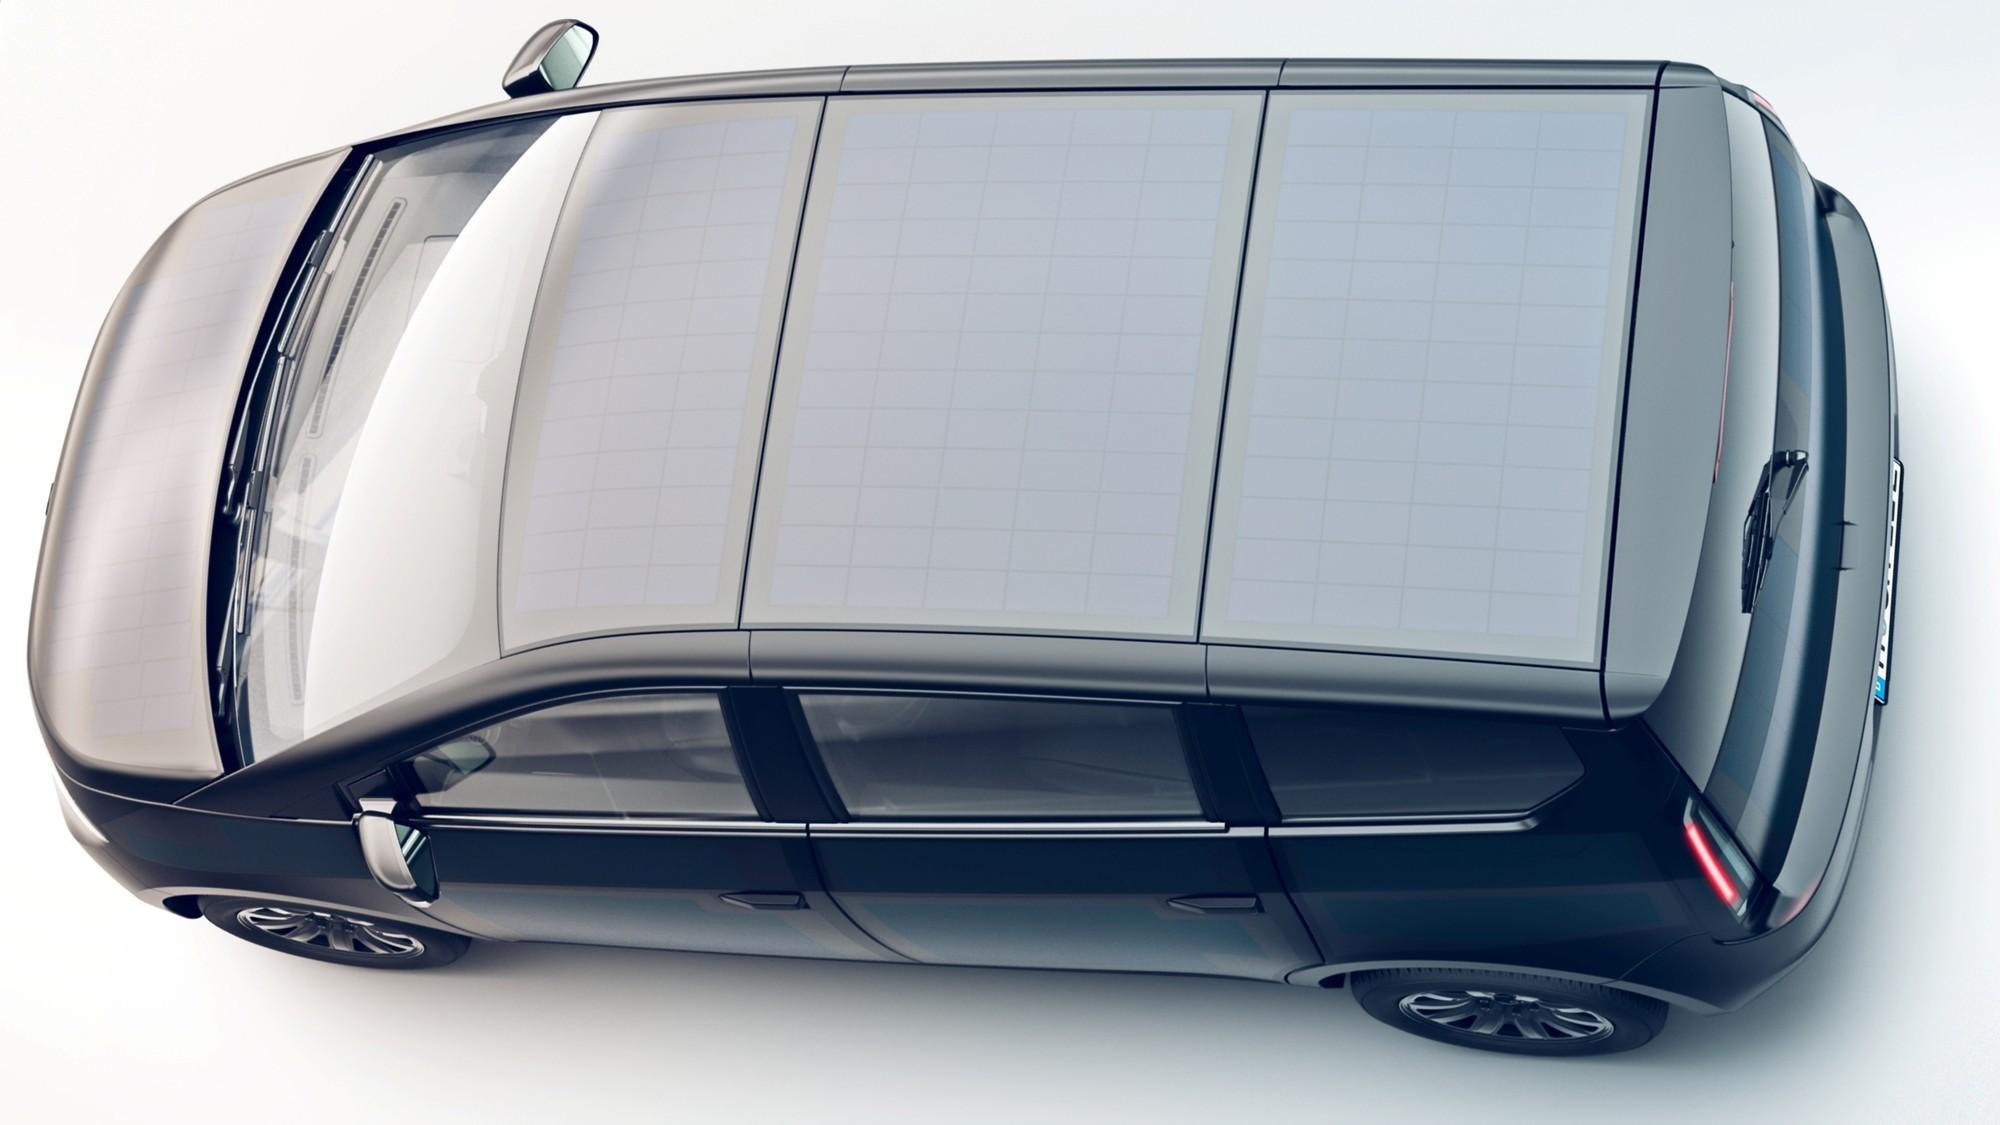 Настоящий «Фольксваген»: бюджетный электромобиль Sono Sion даст бой VW ID.3